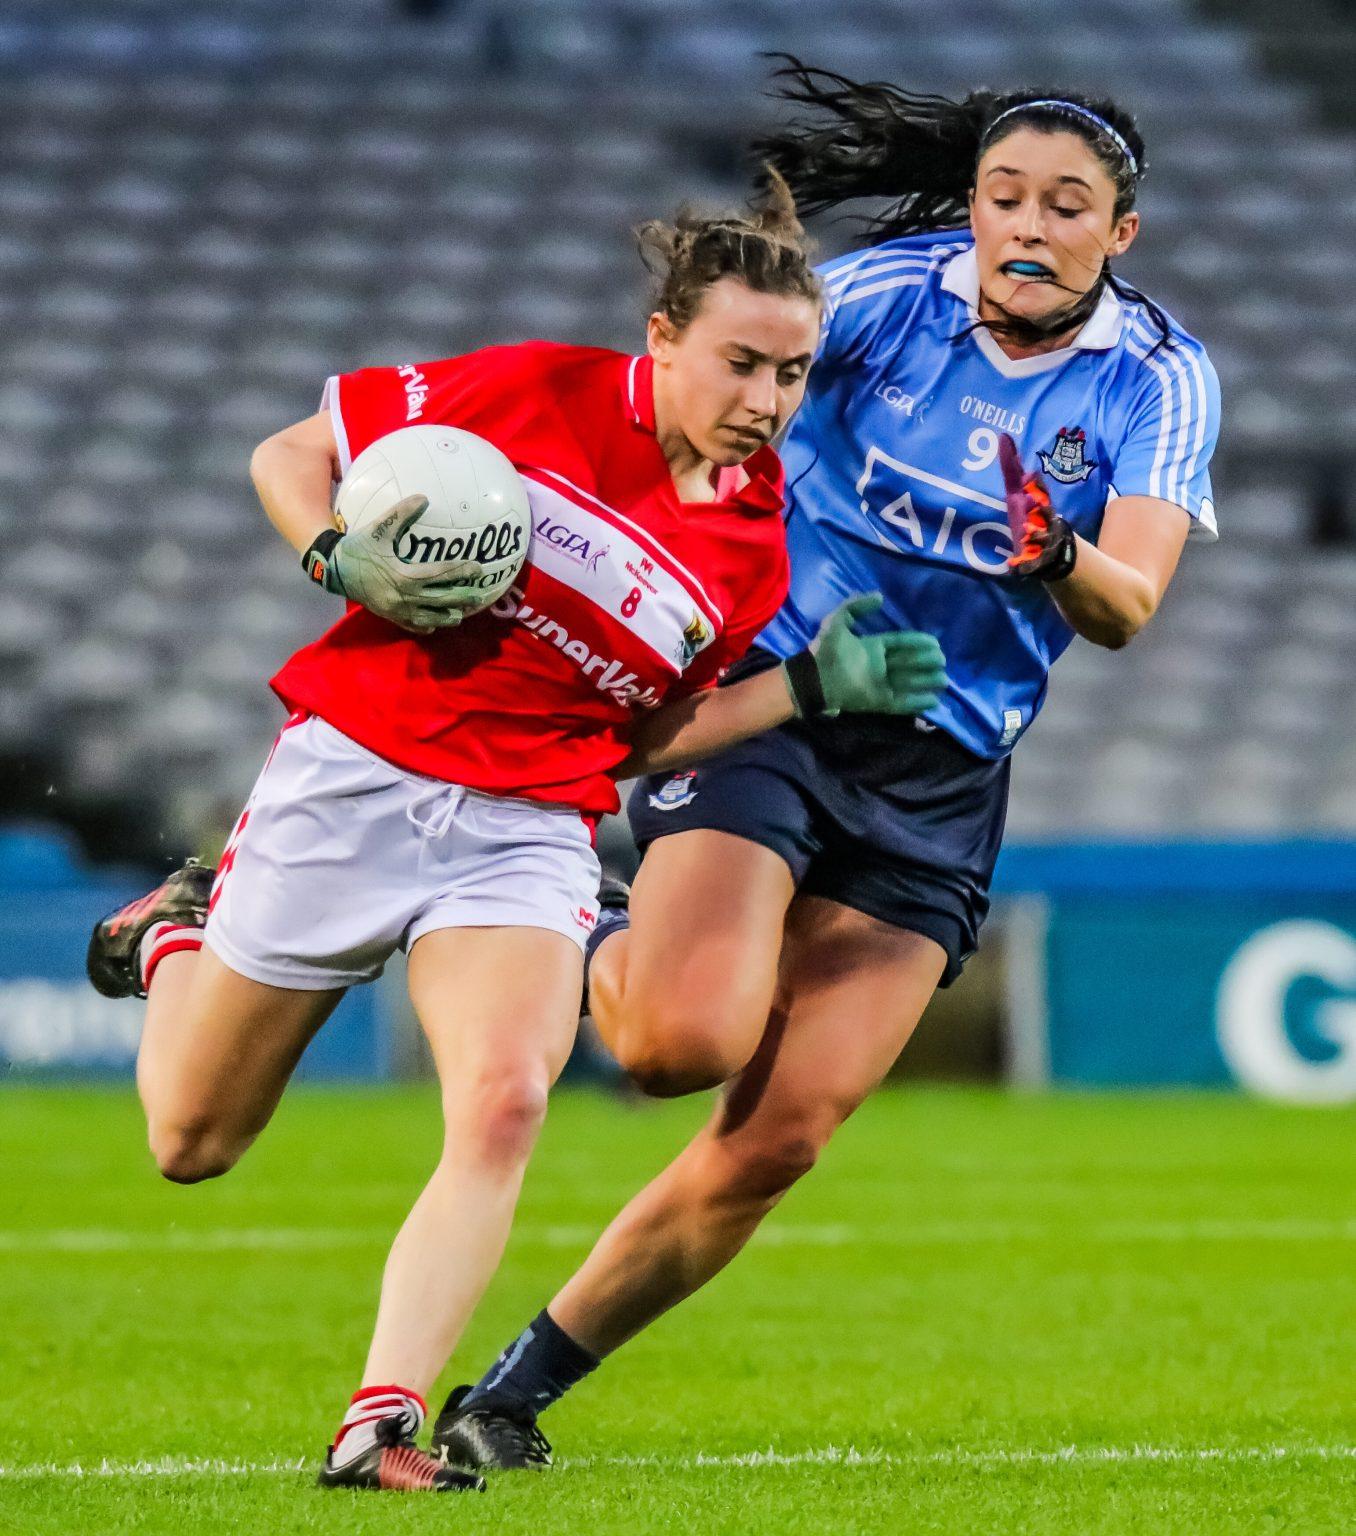 Dublin Midfielder Olwen Carey Putting In A Tackle On Cork's Melissa Duggan